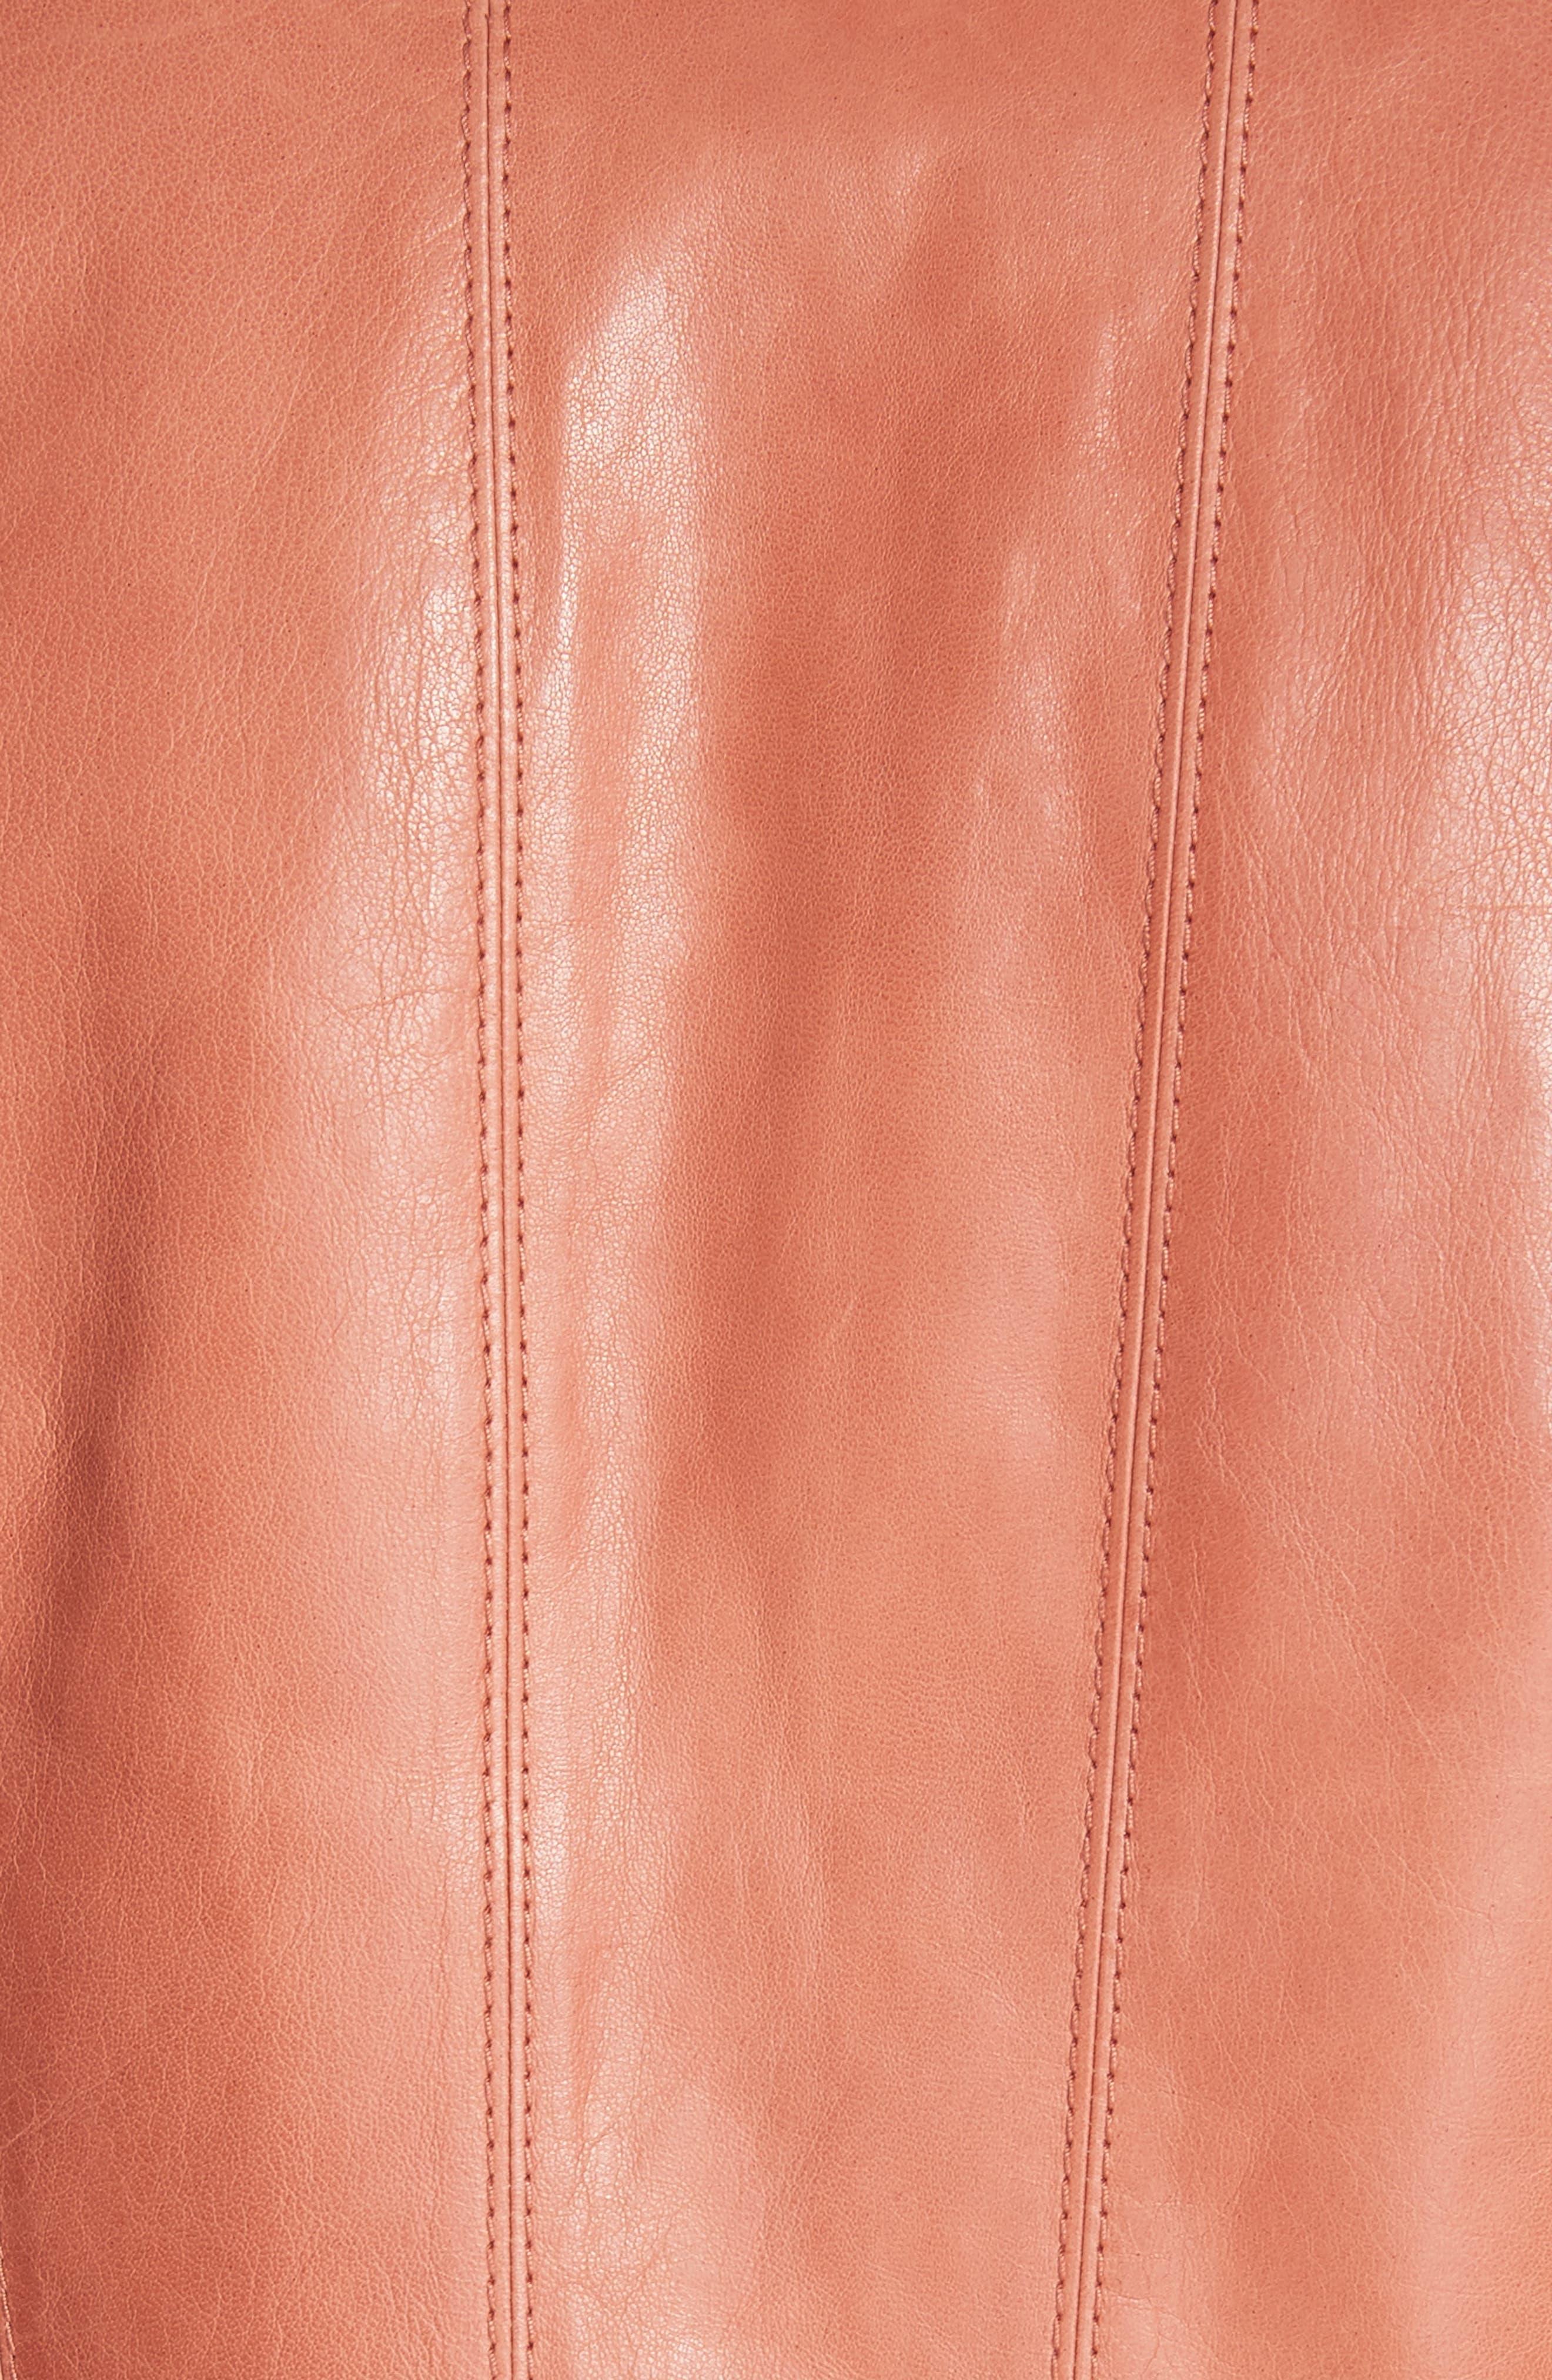 Courtney Glazed Lambskin Leather Jacket,                             Alternate thumbnail 6, color,                             Adobe